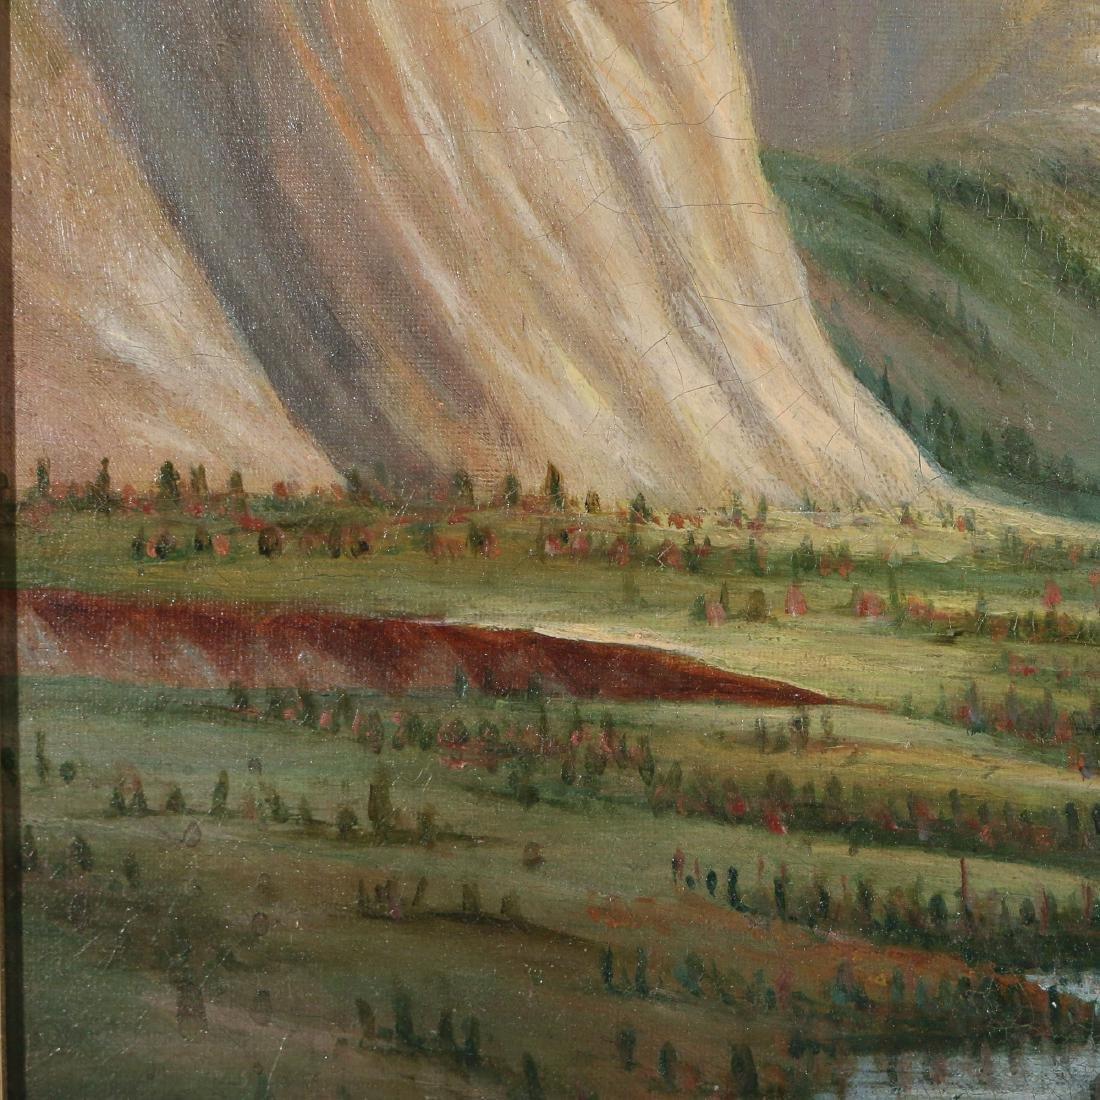 EARLY CALIFORNIA LANDSCAPE, 19th/20th Century - 6